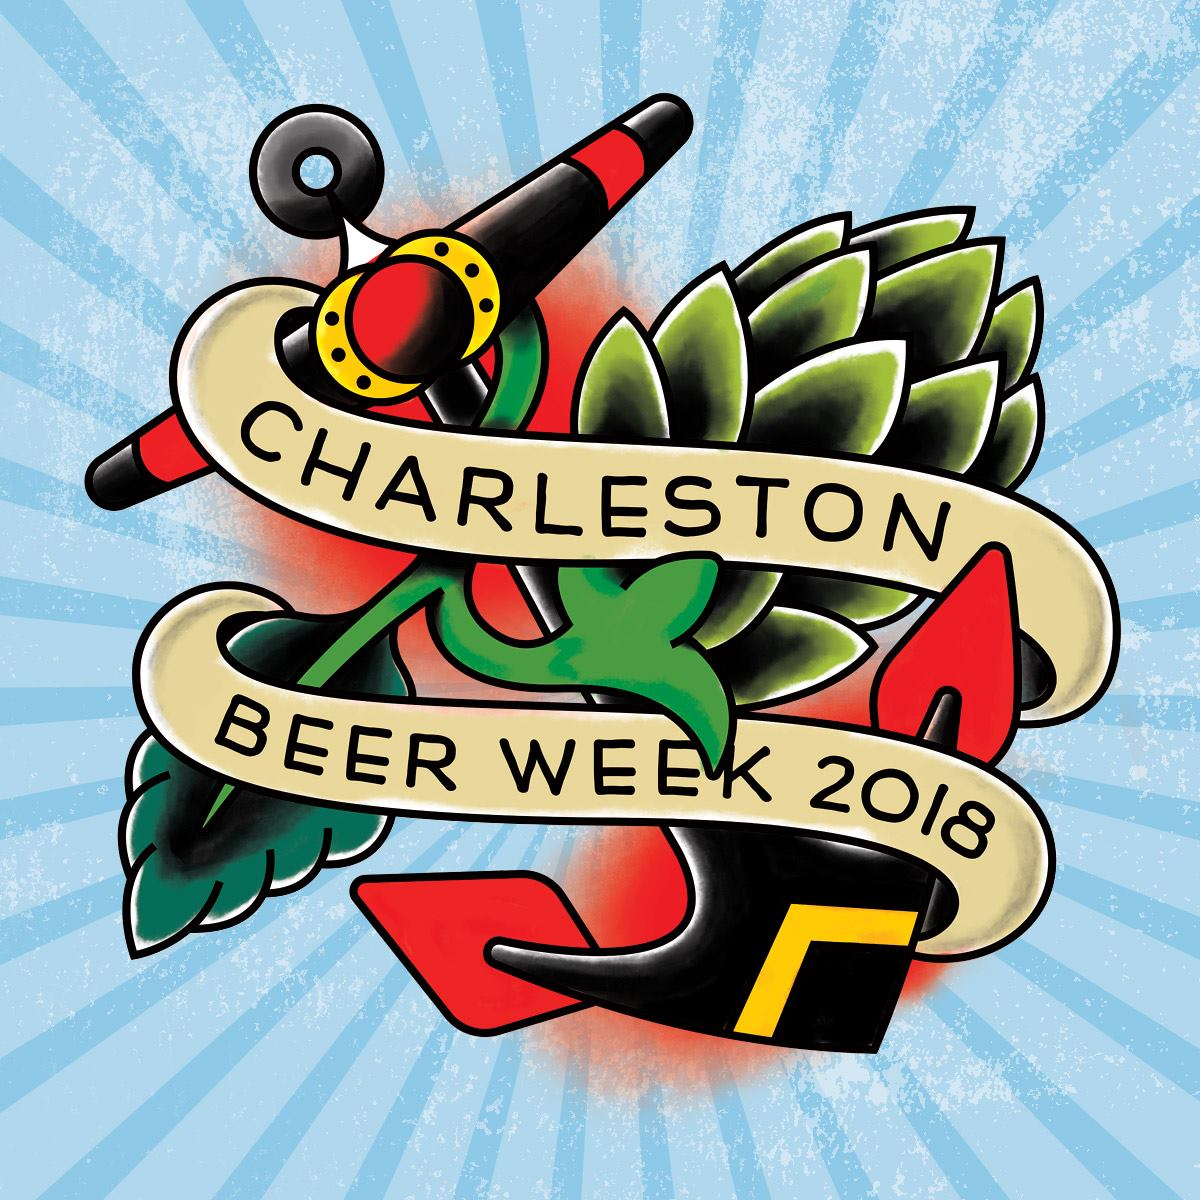 Charleston Beer Week Logo with Blue Burst Background